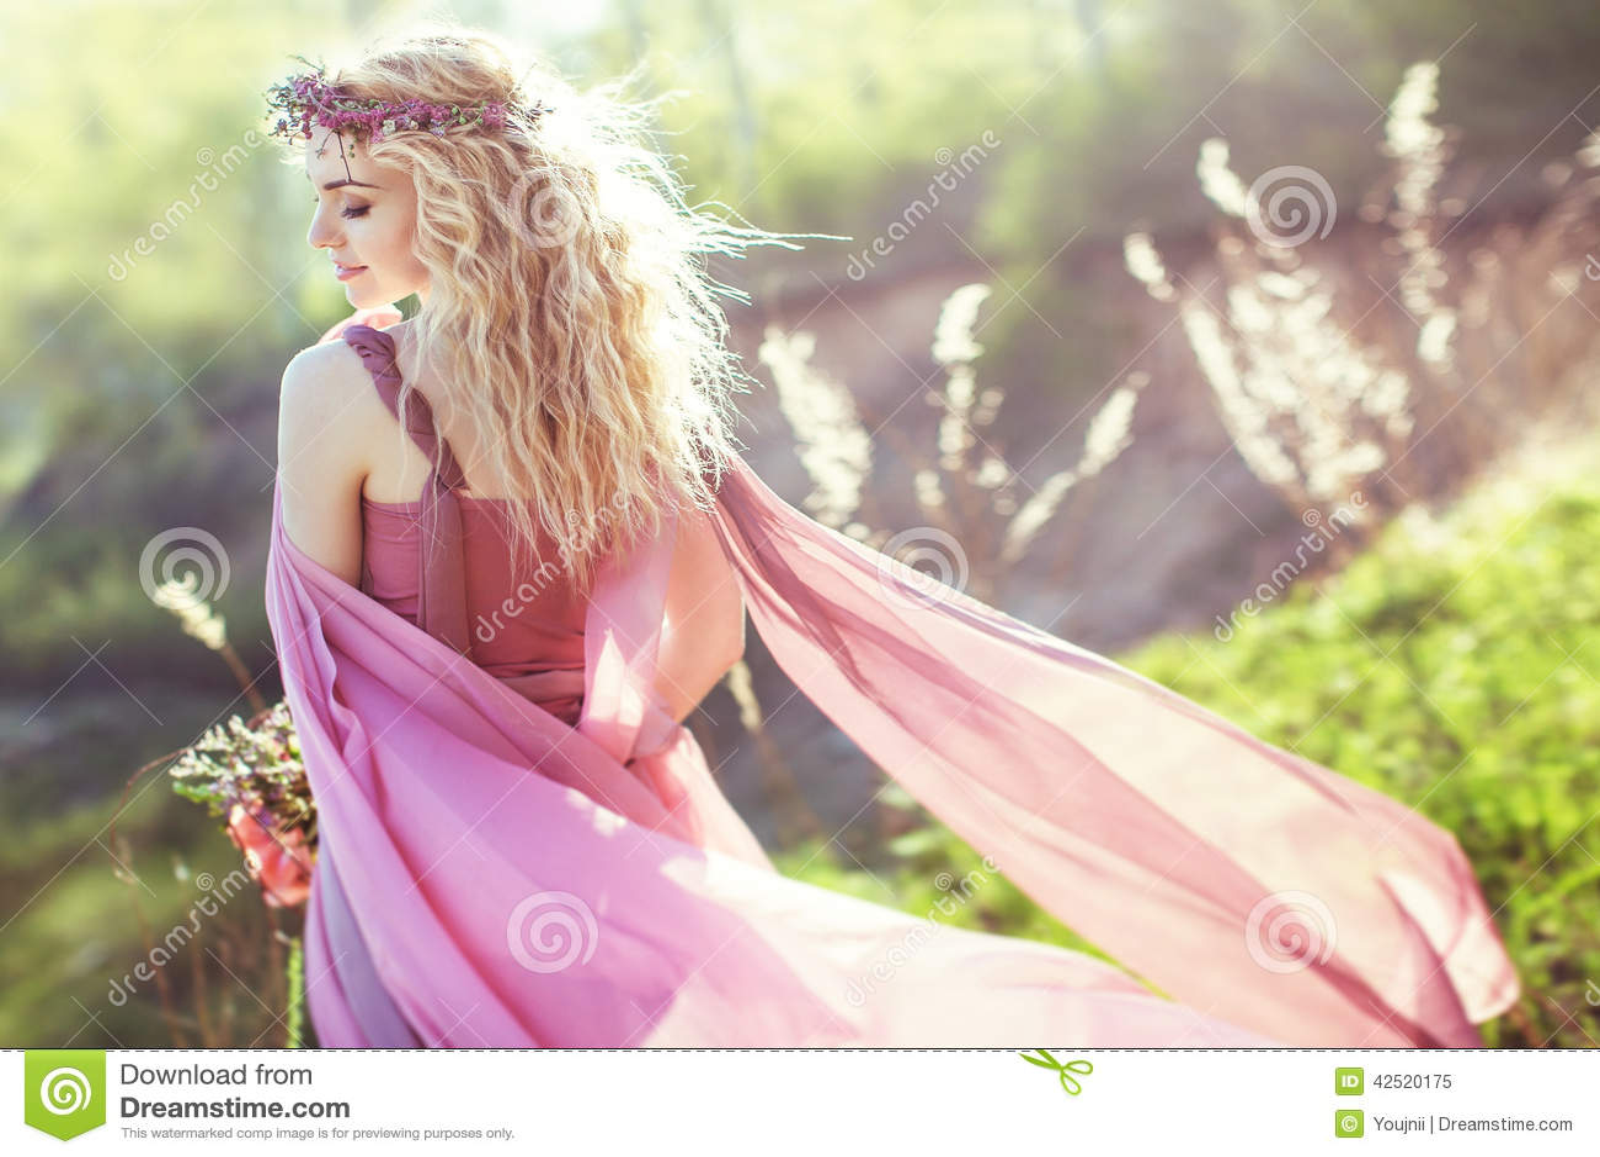 Beautiful blonde girl in pink long dress